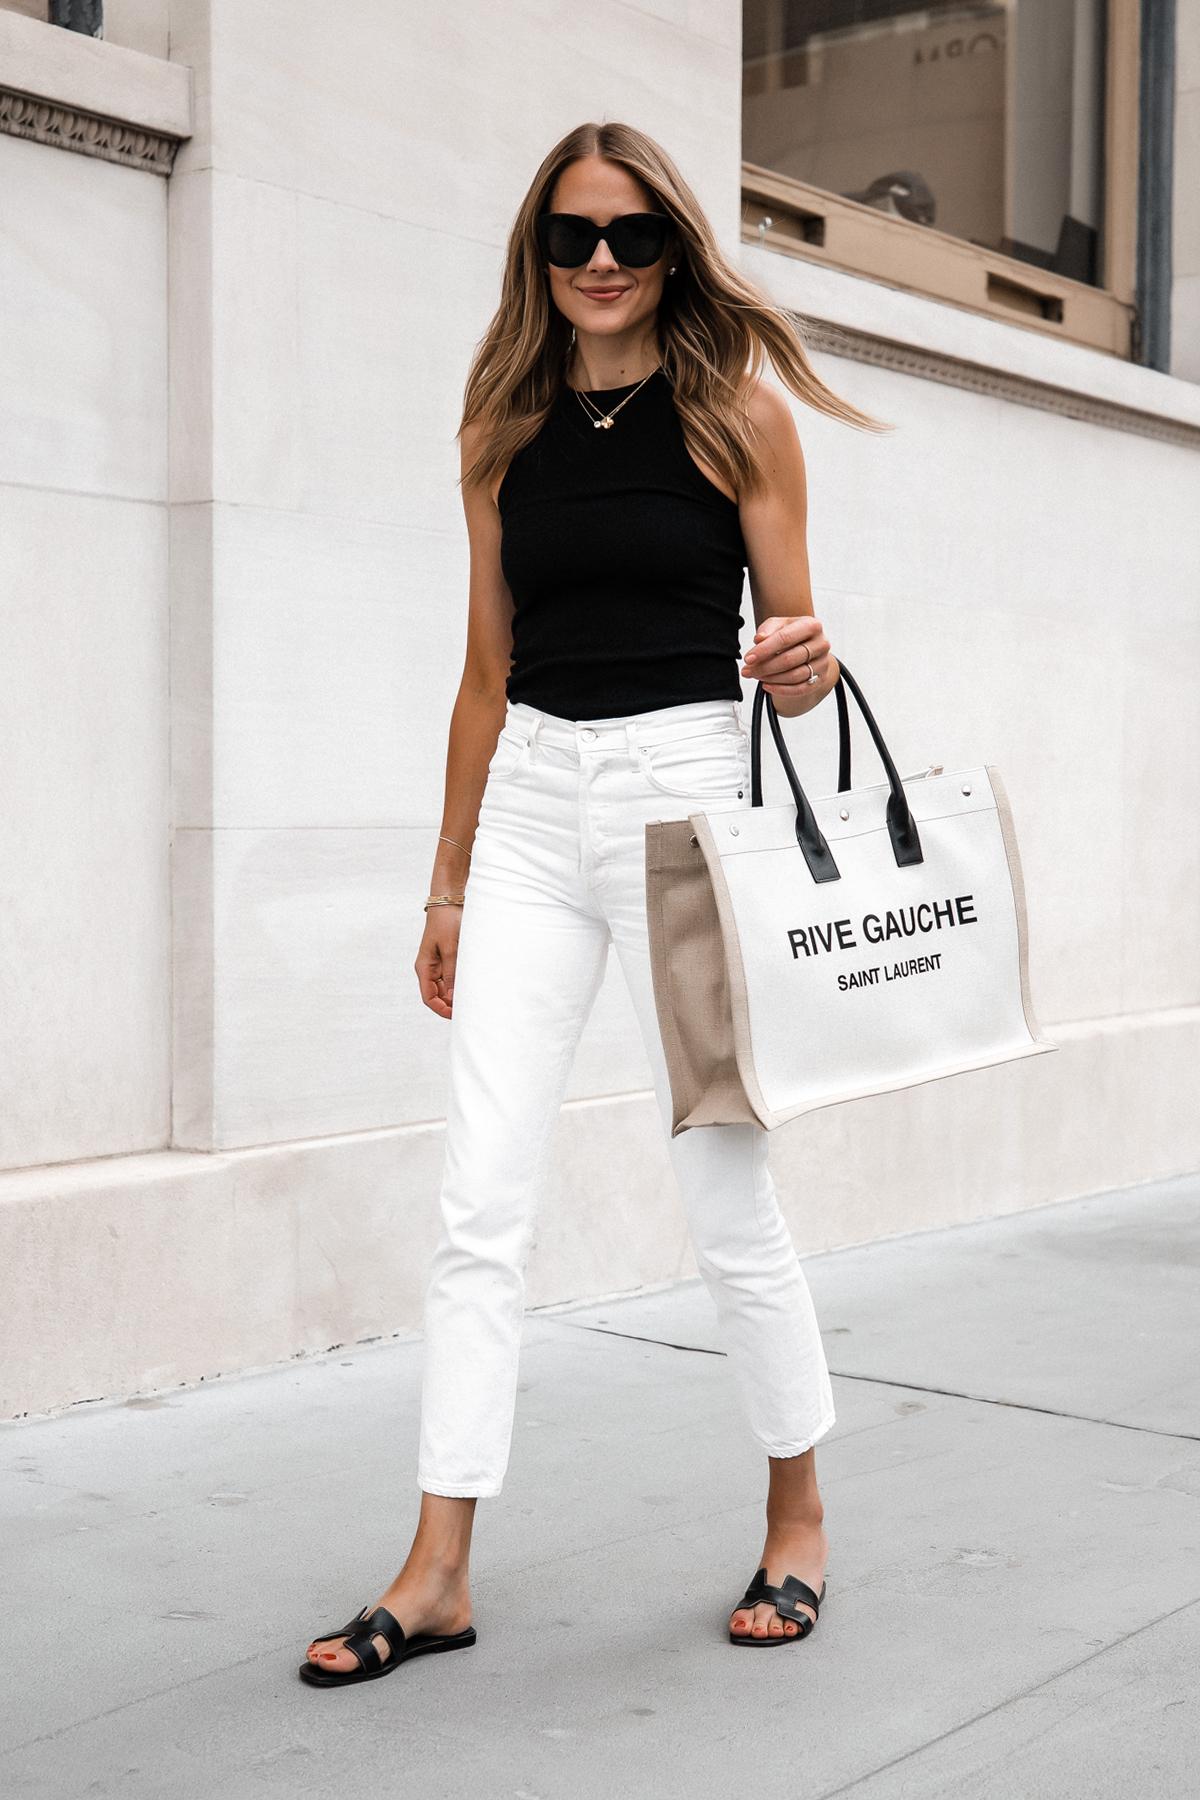 Fashion Jackson Wearing Black Tank White Skinny Jeans Hermes Oran Black Sandals Saint Laurent Rive Gauche Logo Tote Bag Street Style